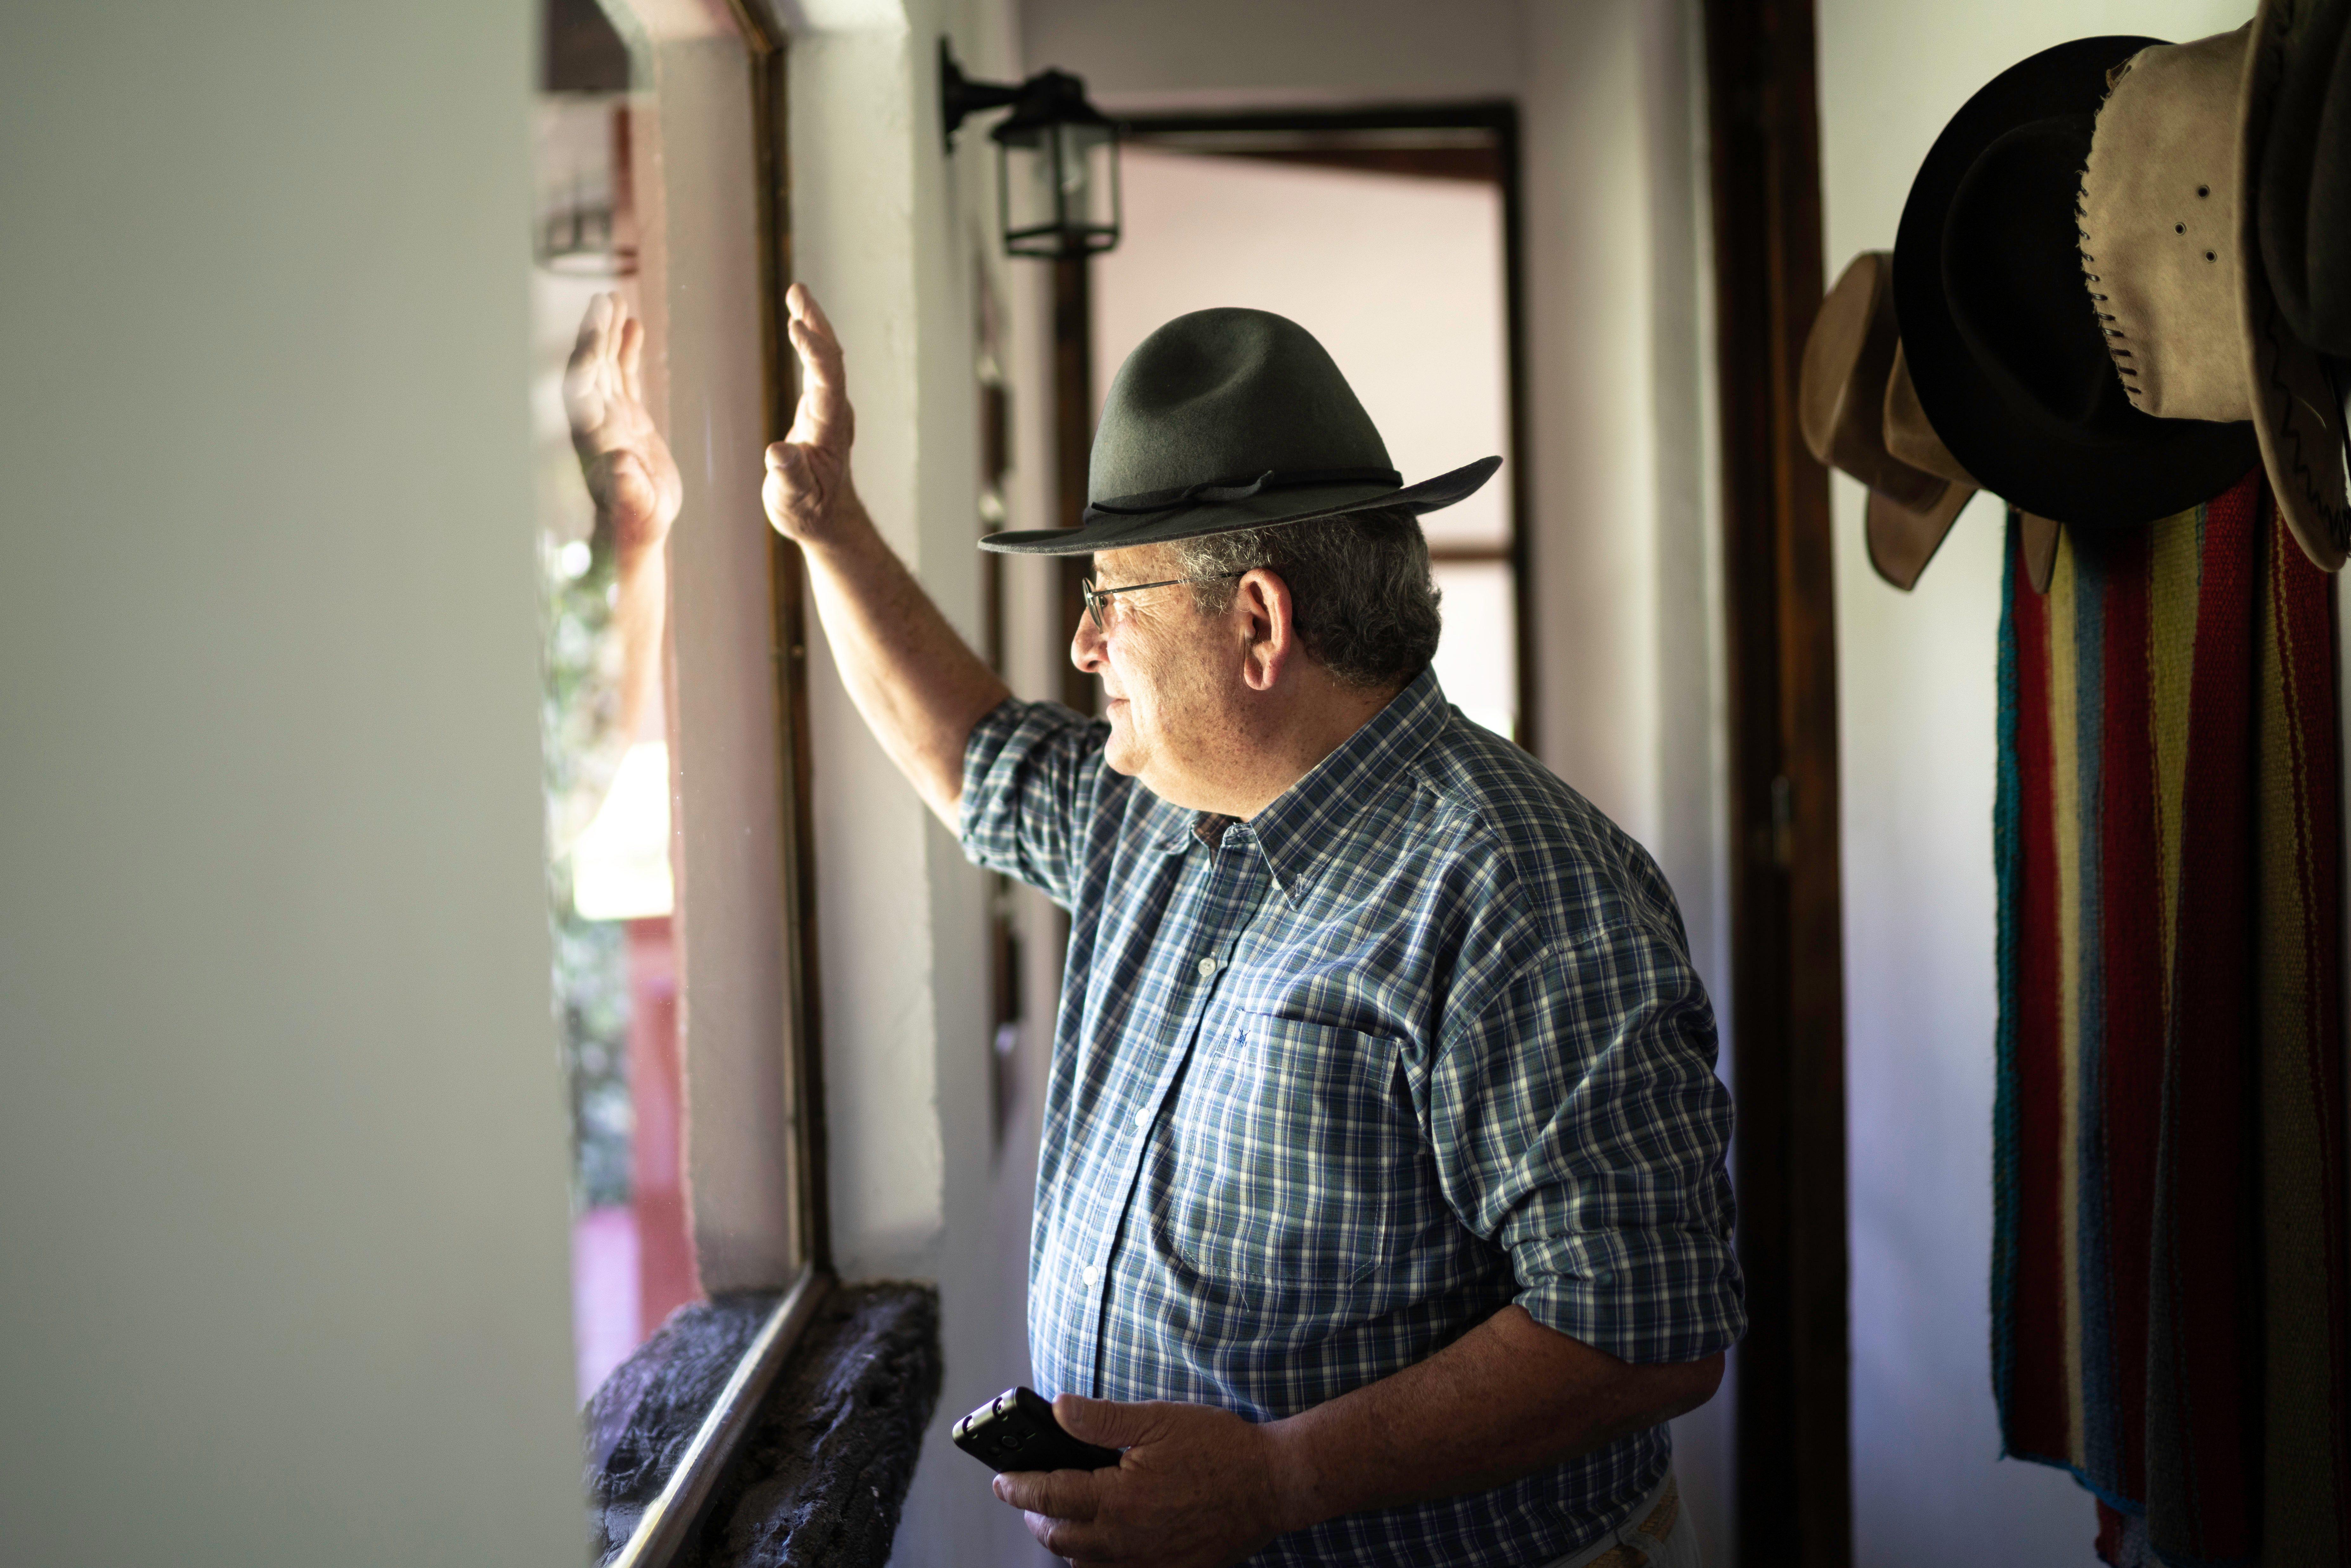 Senior man waving through the window